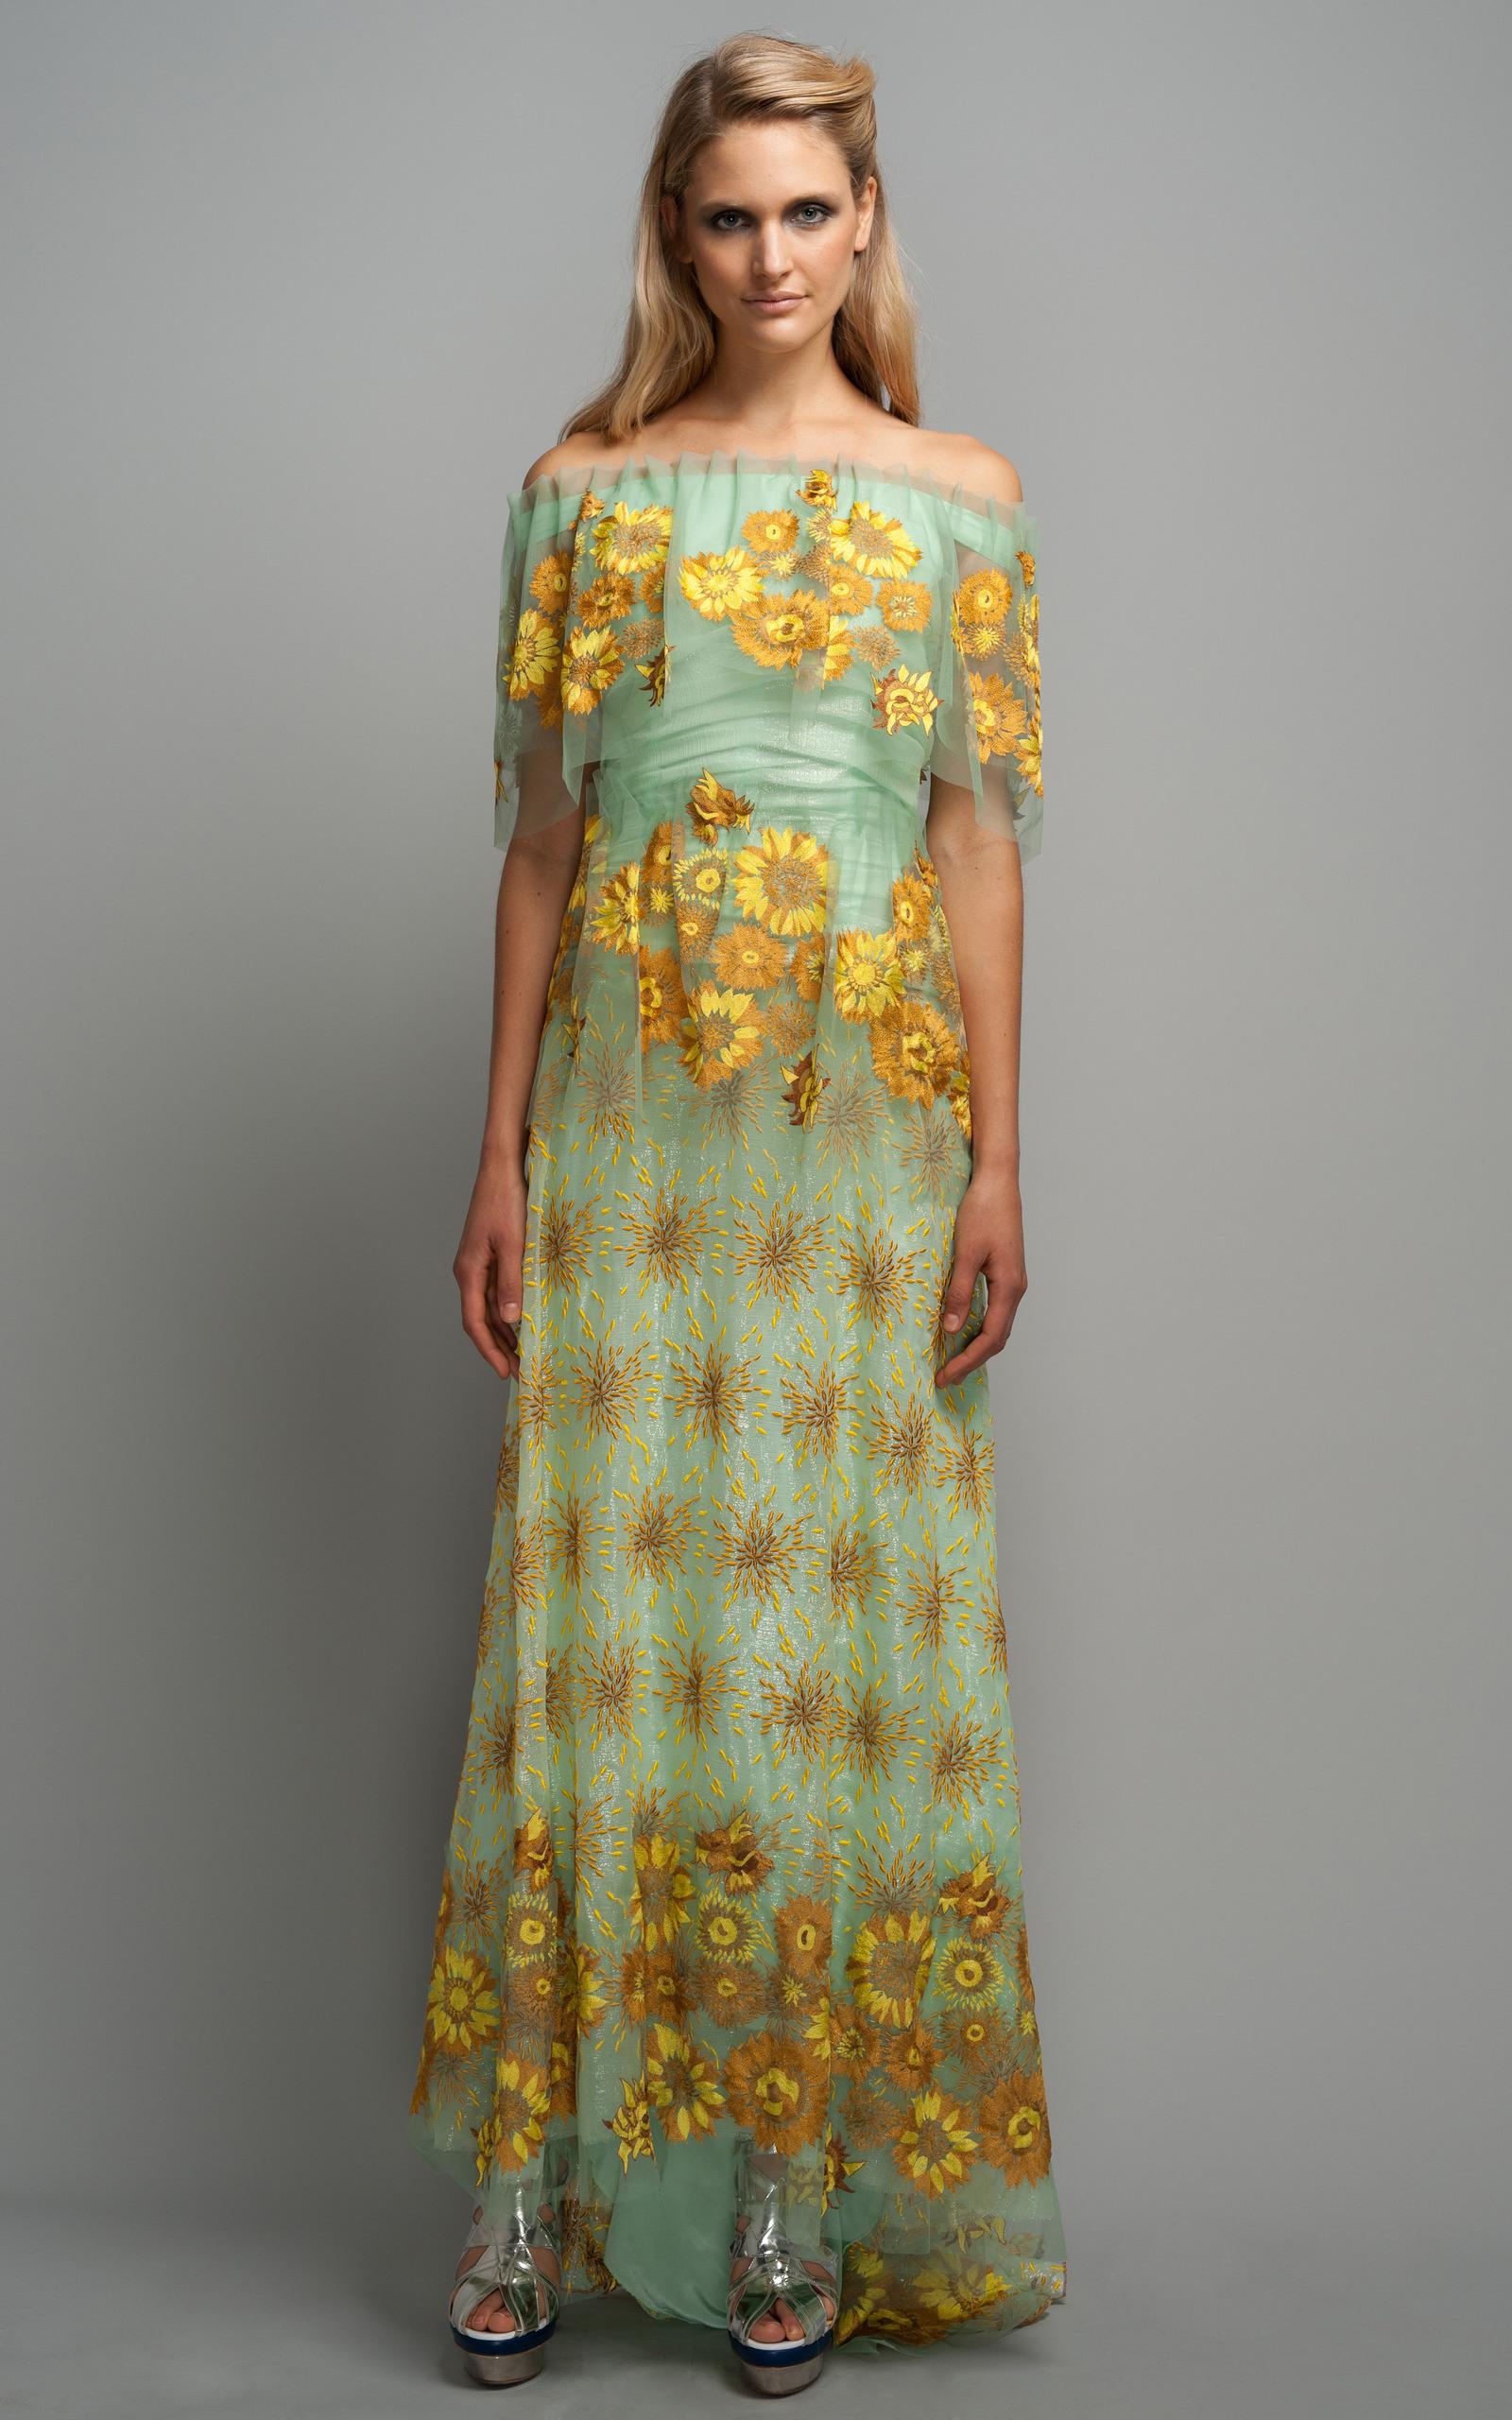 Moda Operandi | Seafoam Sunflower Gown by Rodarte